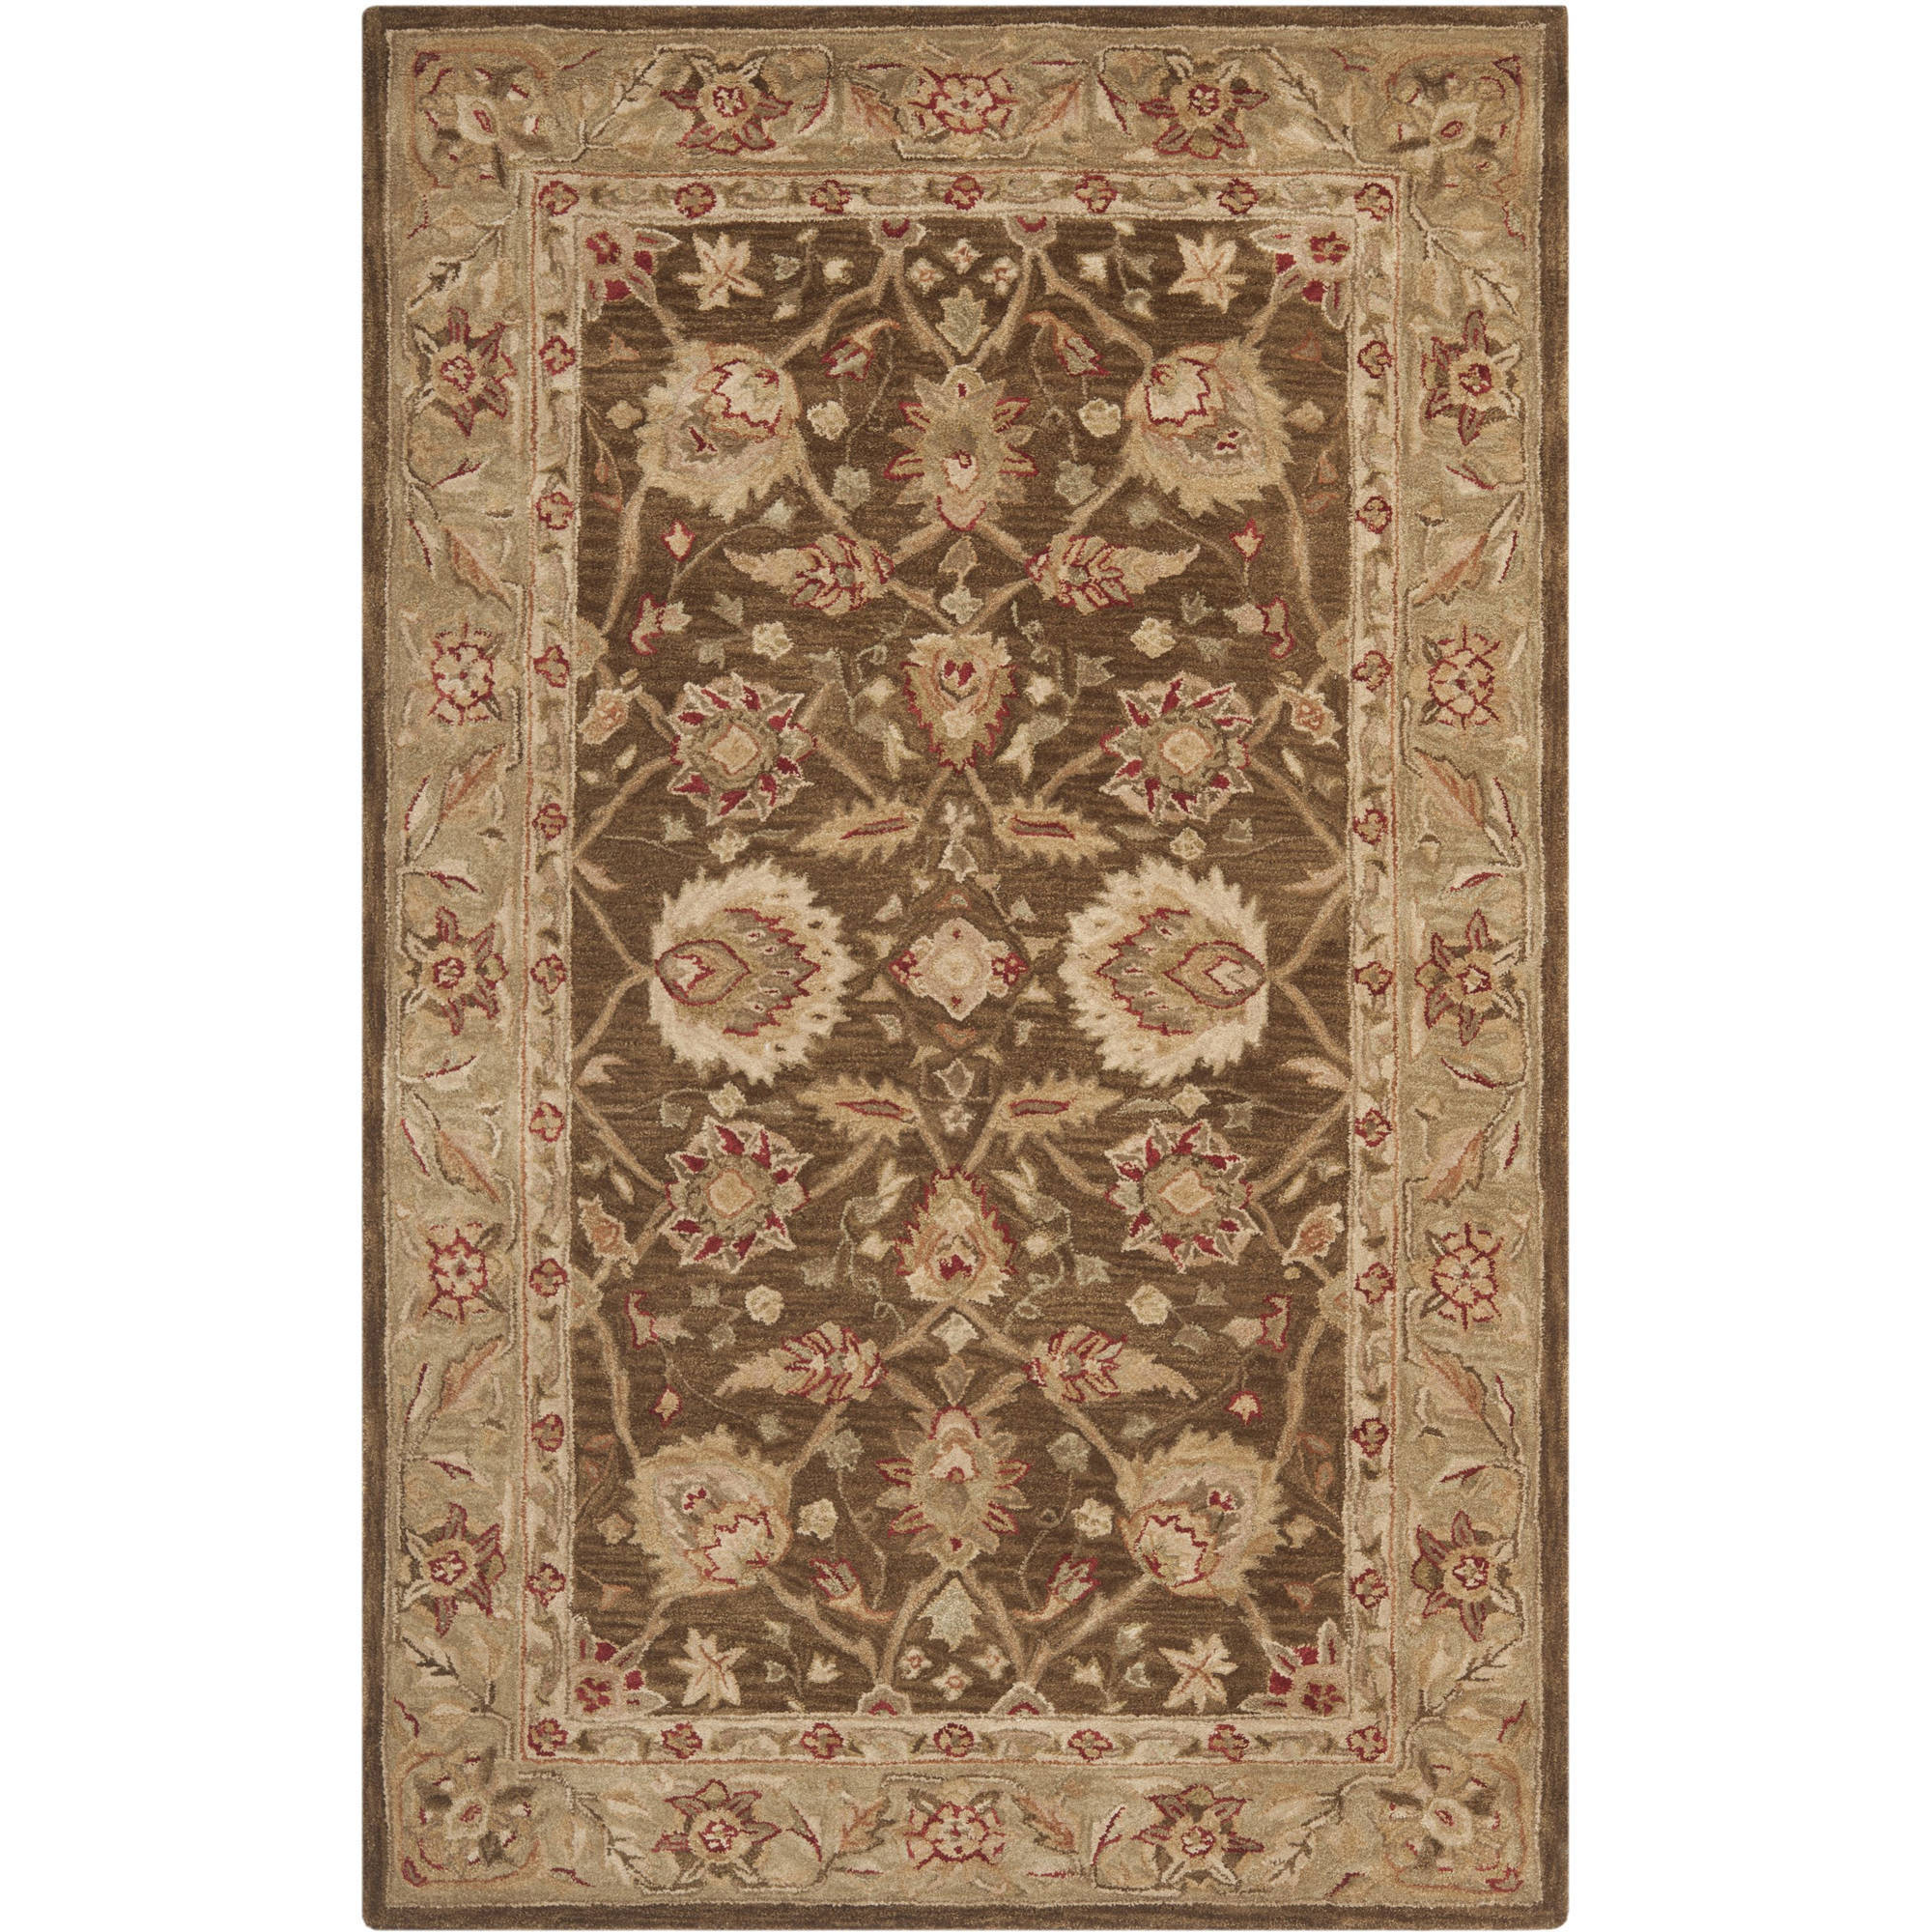 Safavieh Anatolia Venice Hand-Tufted Wool Area Rug